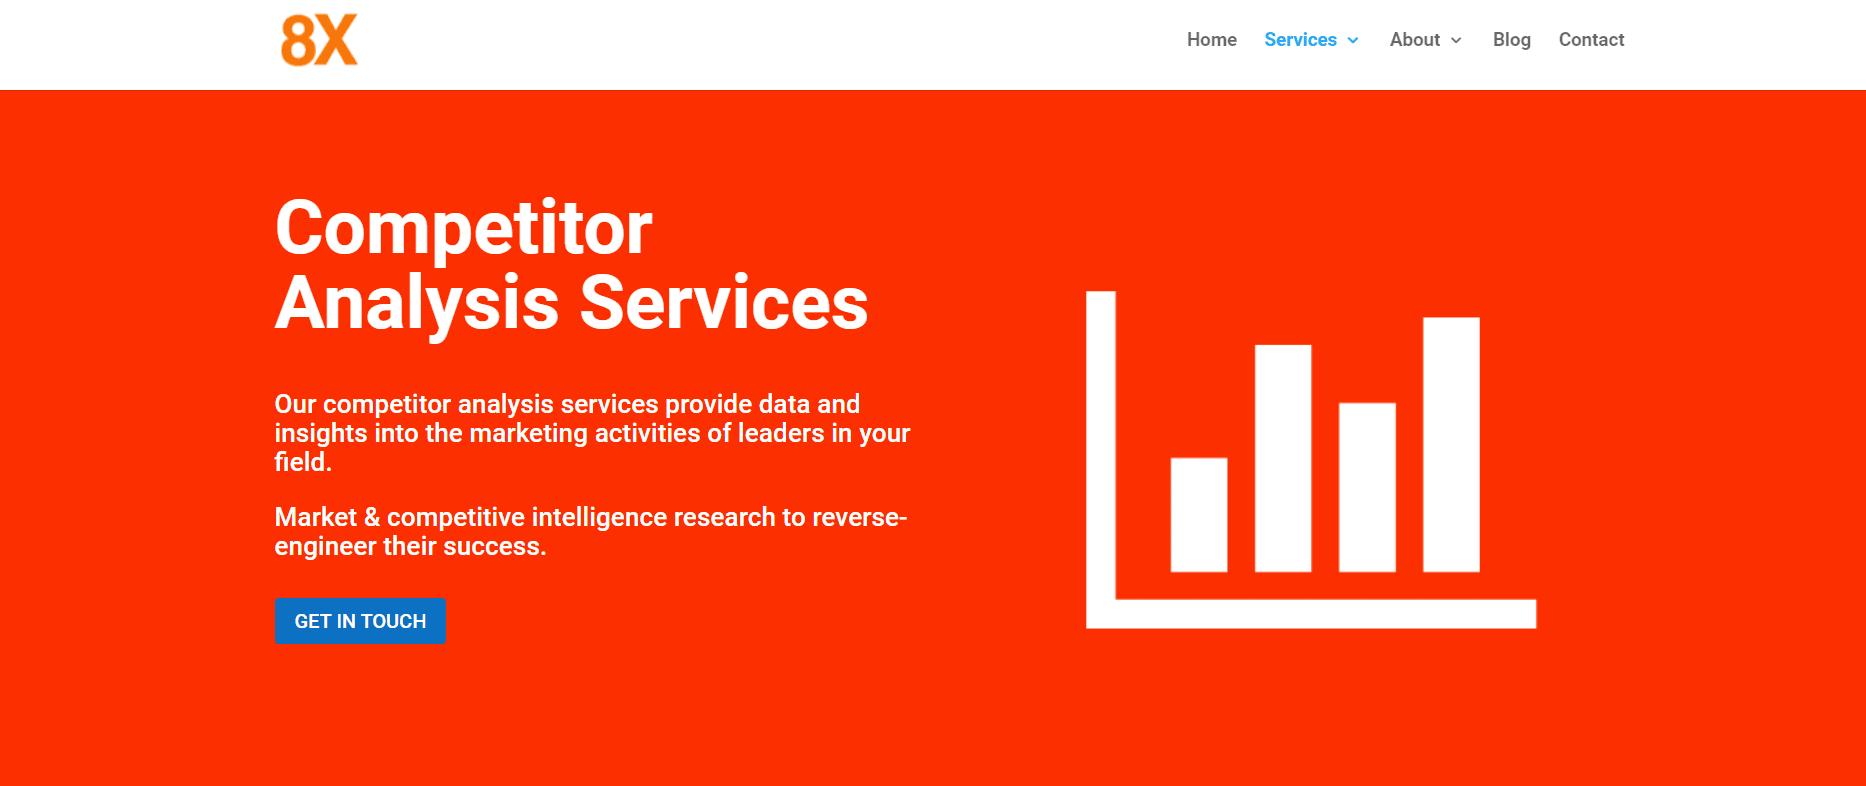 8x HQ  Market Research Company